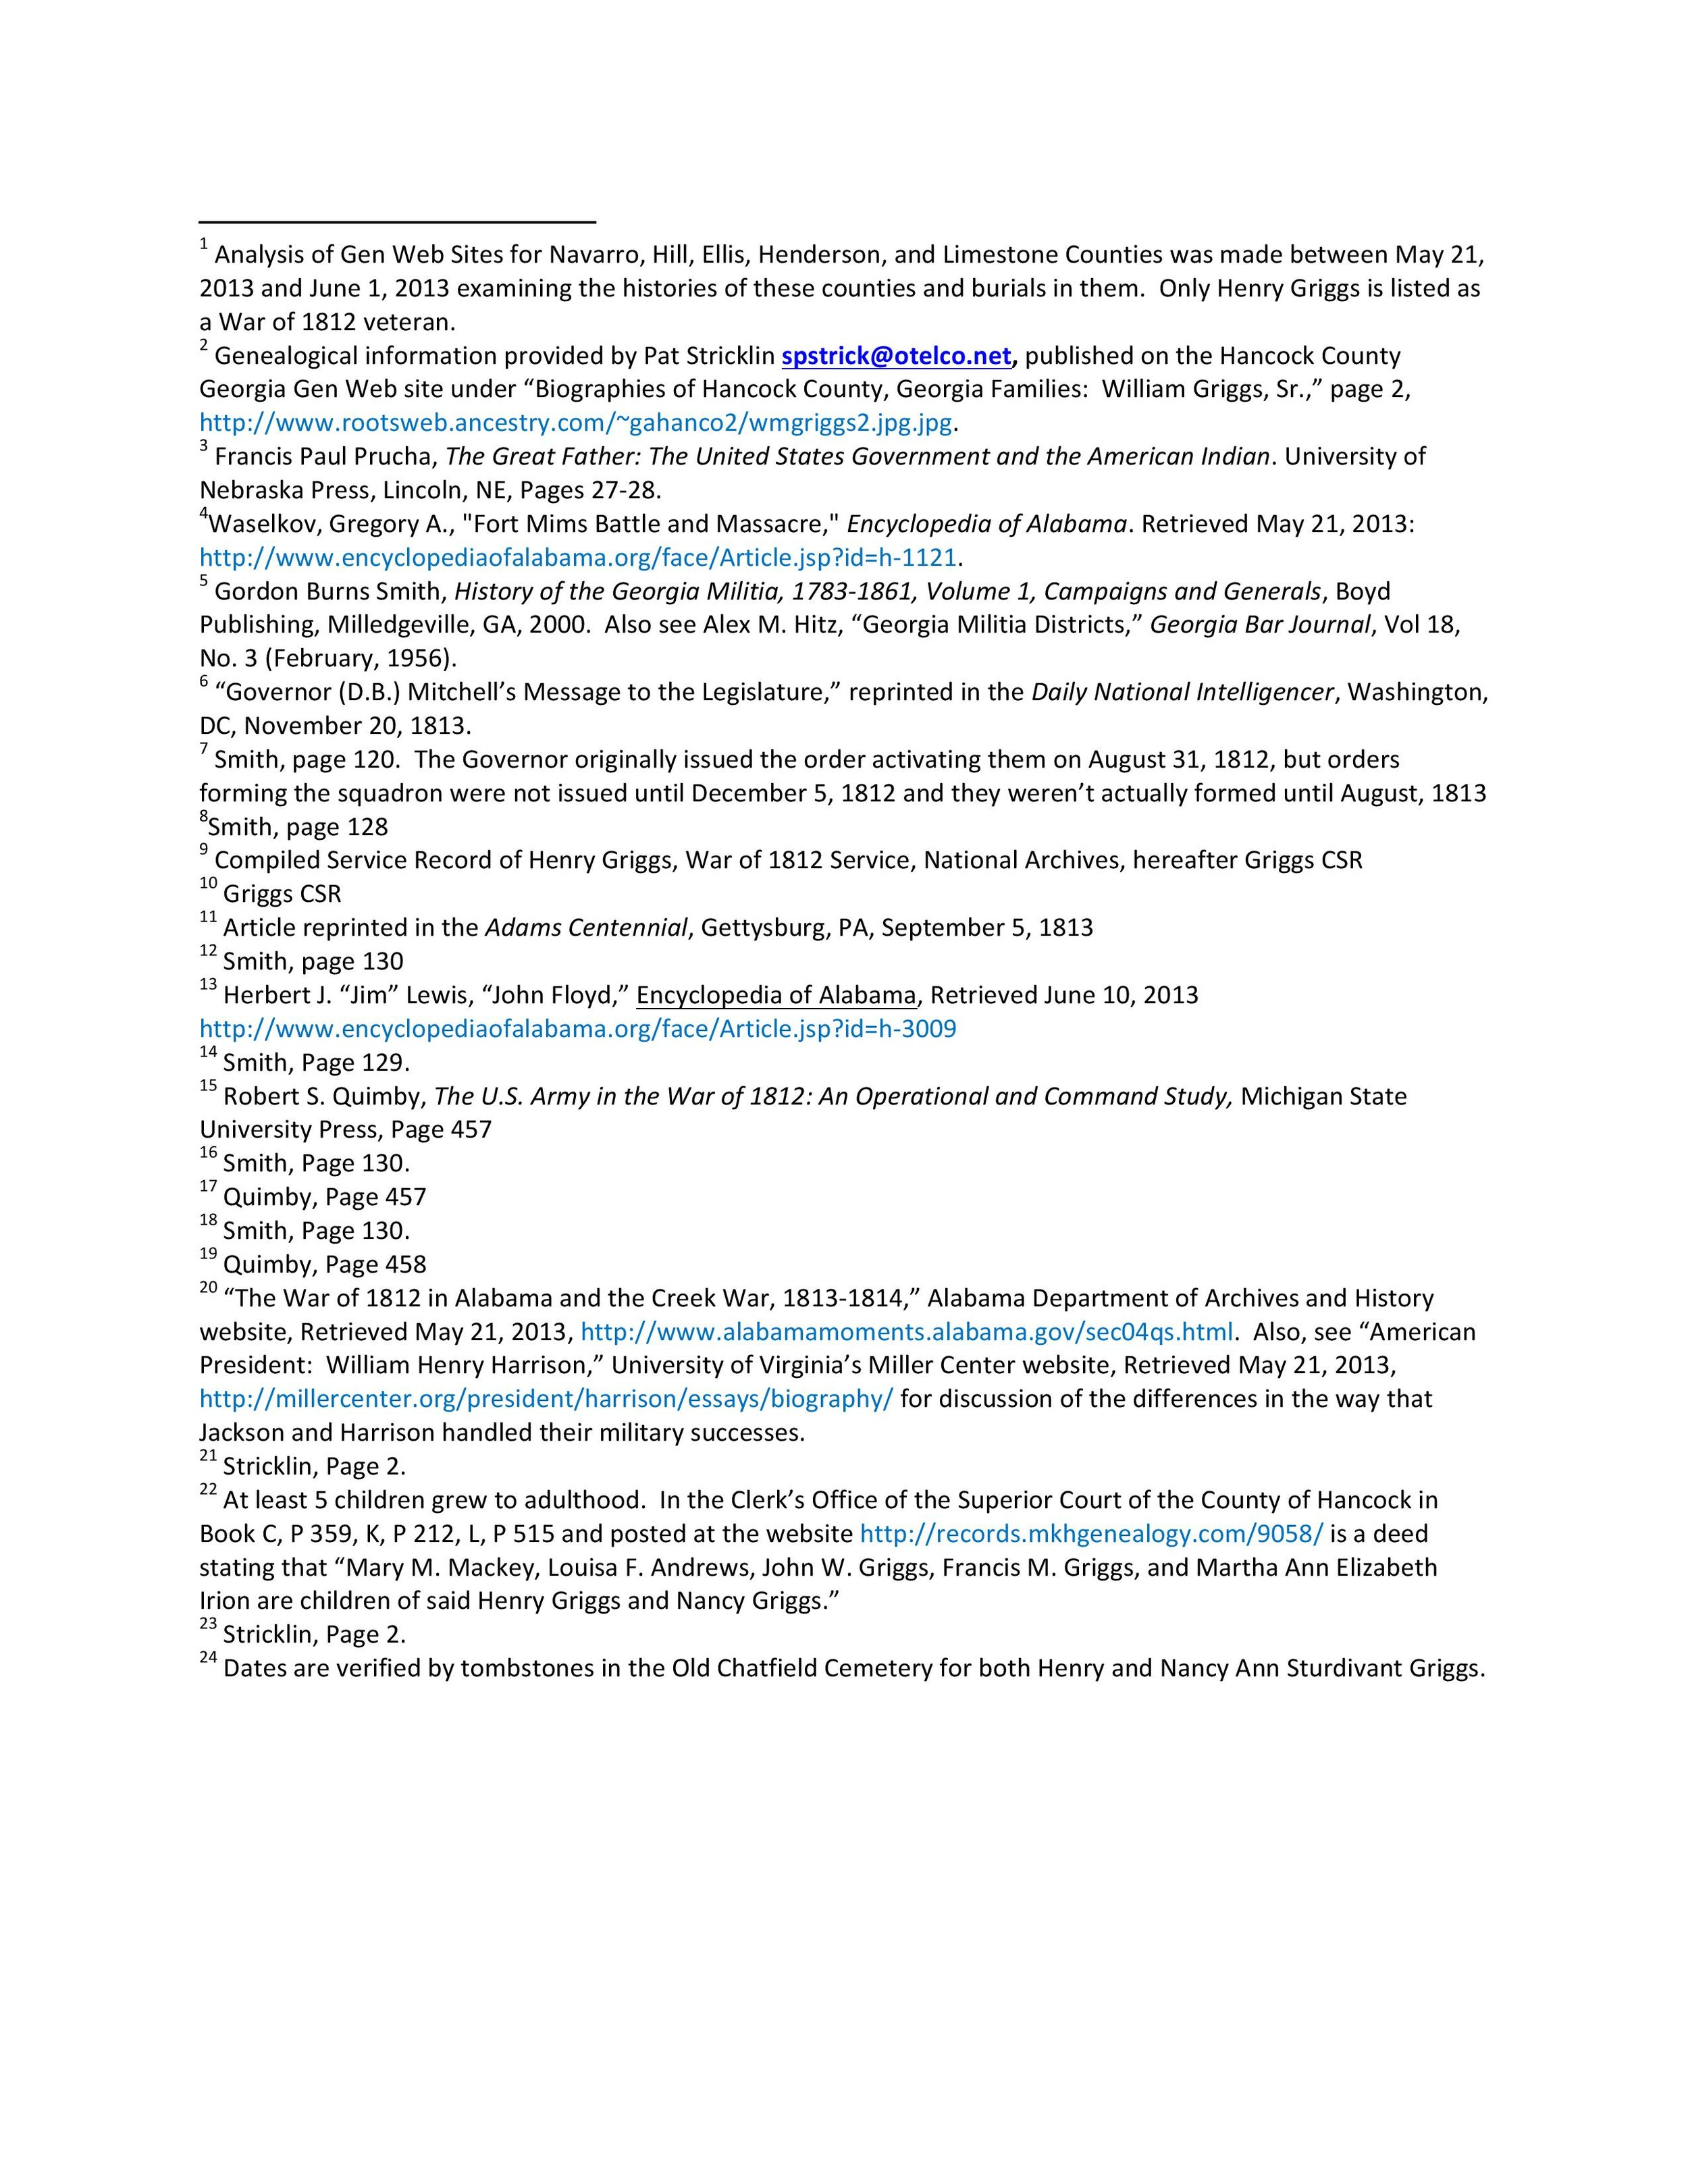 Henry Griggs: Bio, Citations